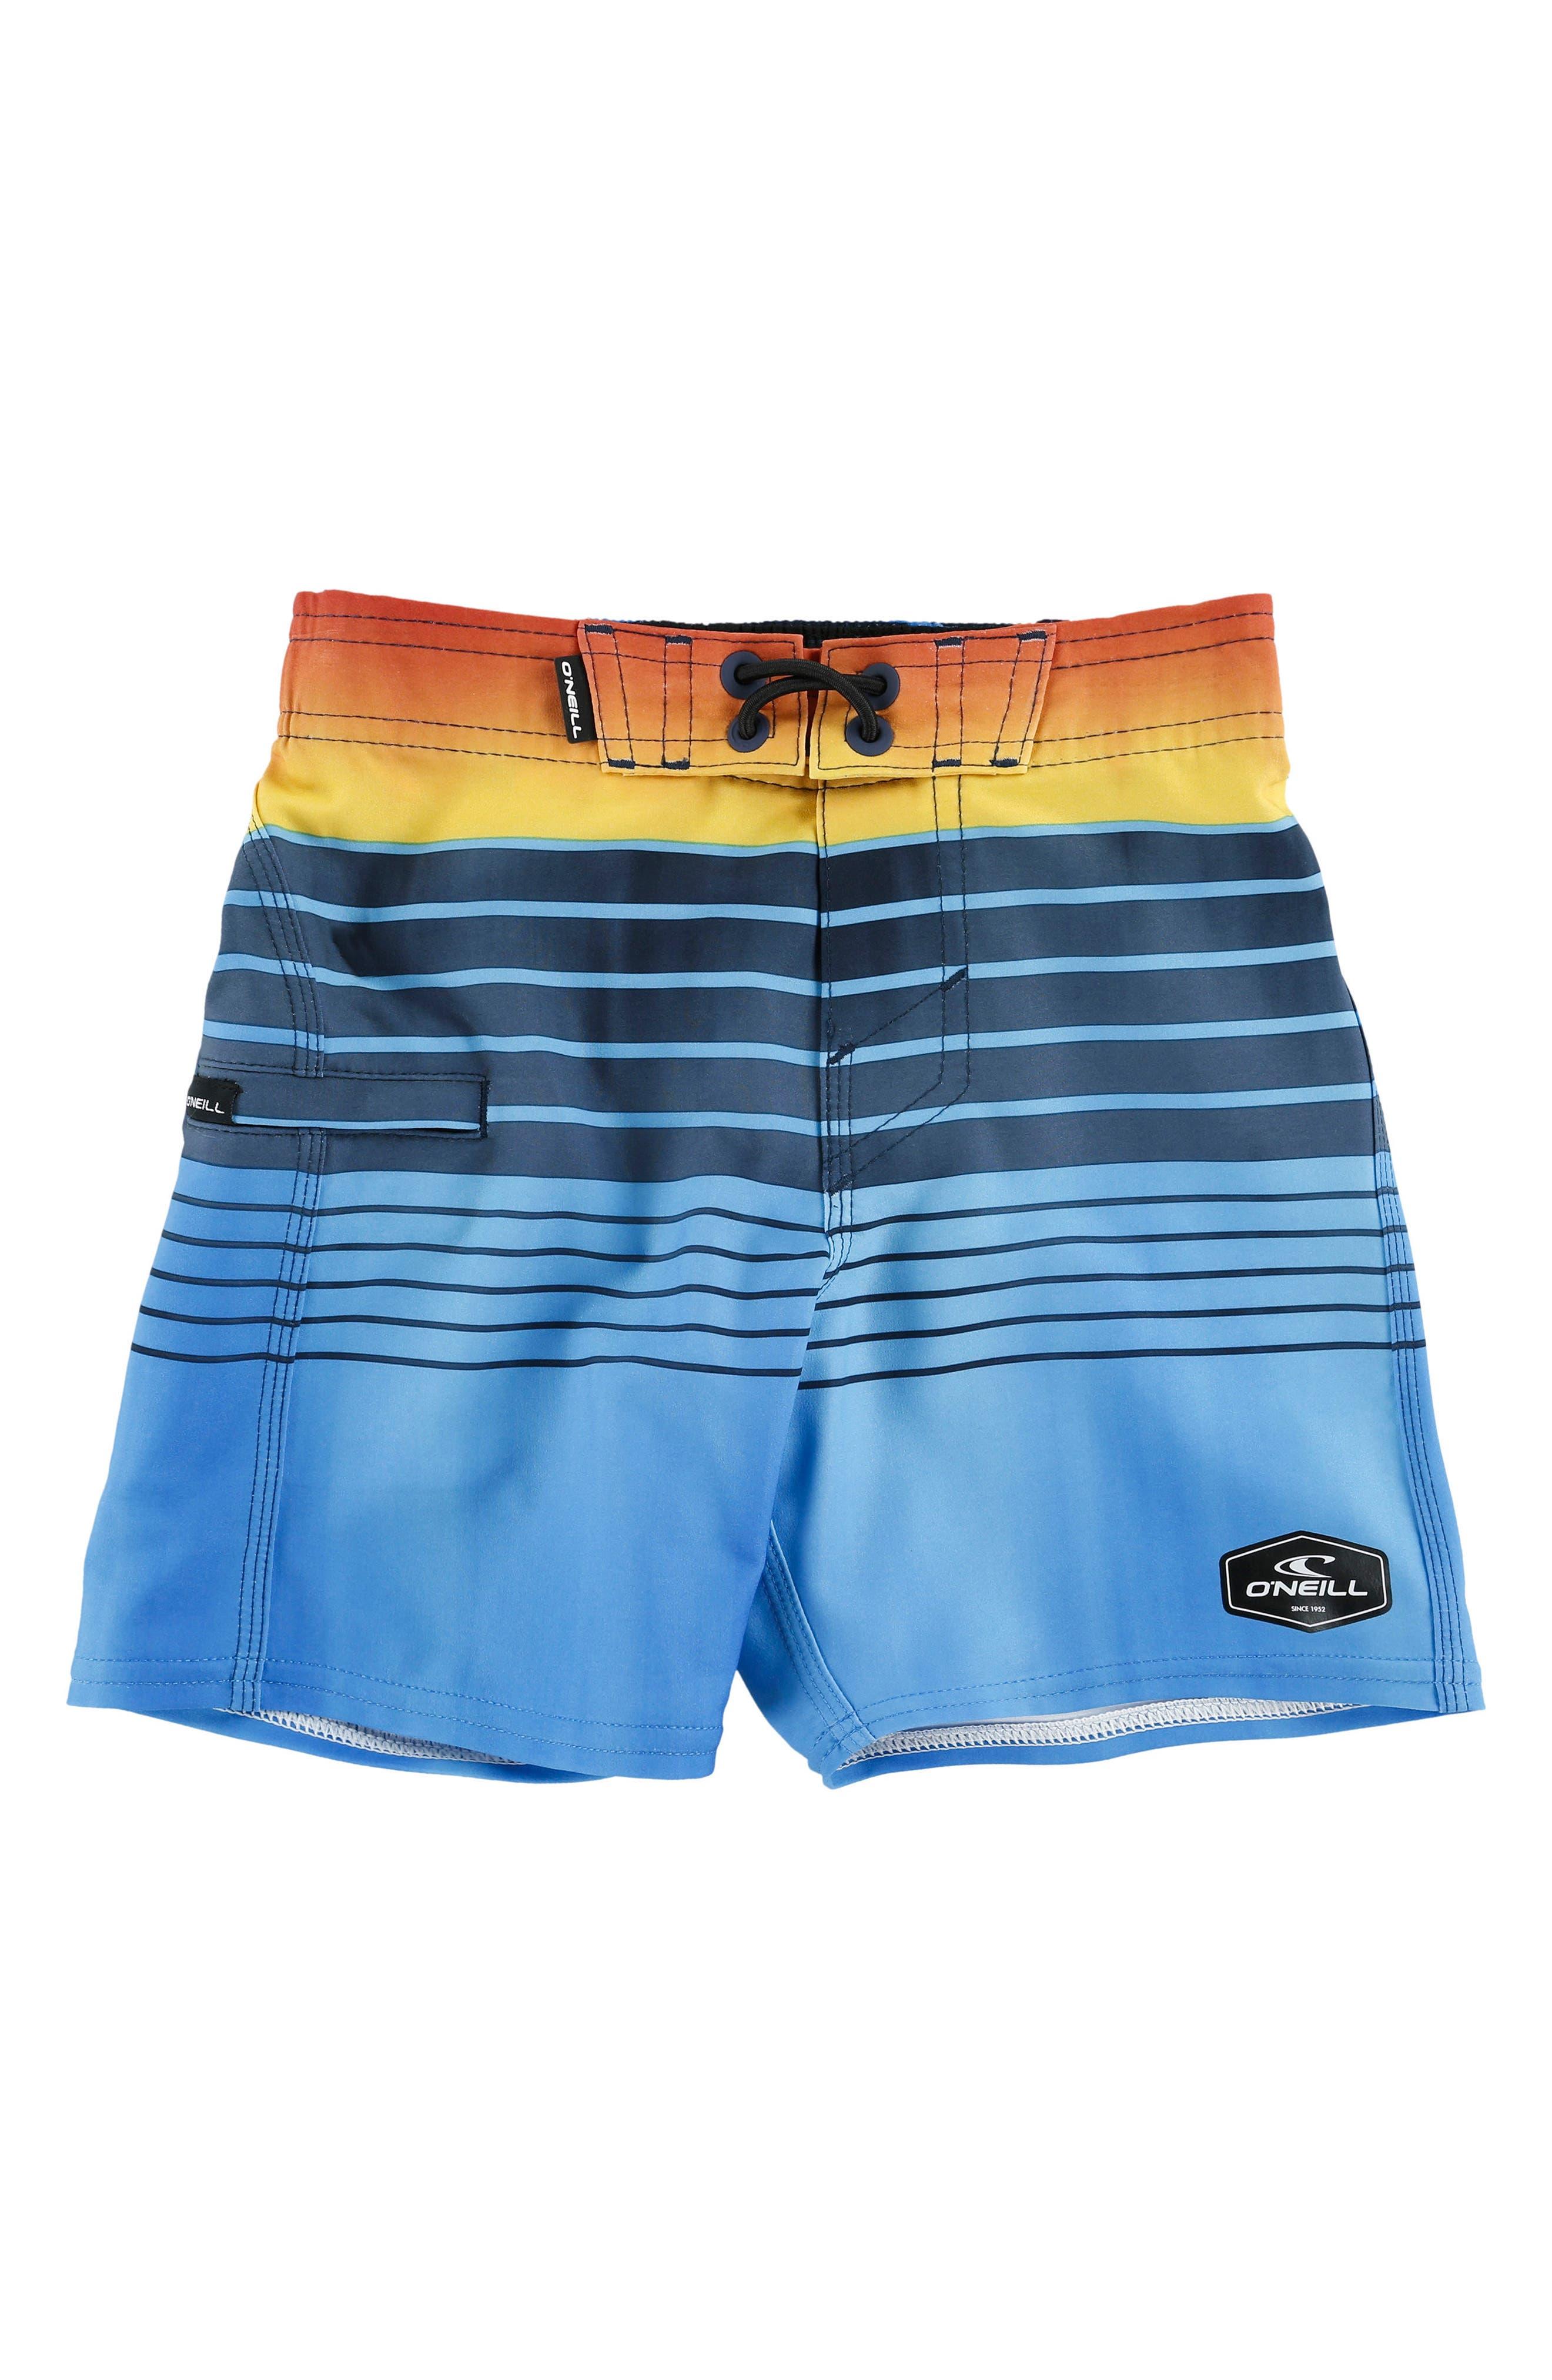 Hyperfreak Heist Board Shorts,                             Main thumbnail 1, color,                             Blue